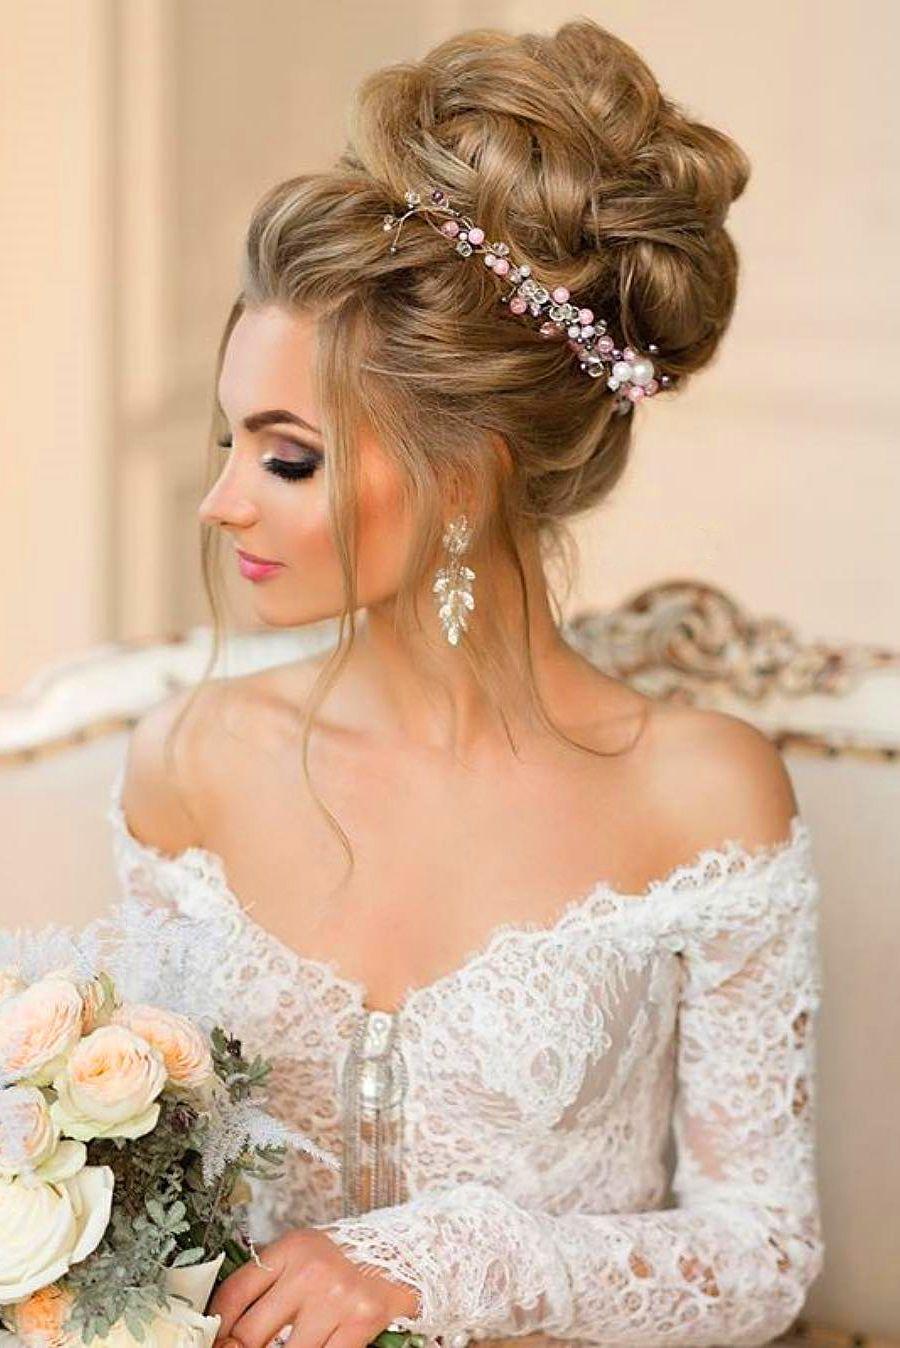 30 wedding bun hairstyles | wedding hairstyles & updos